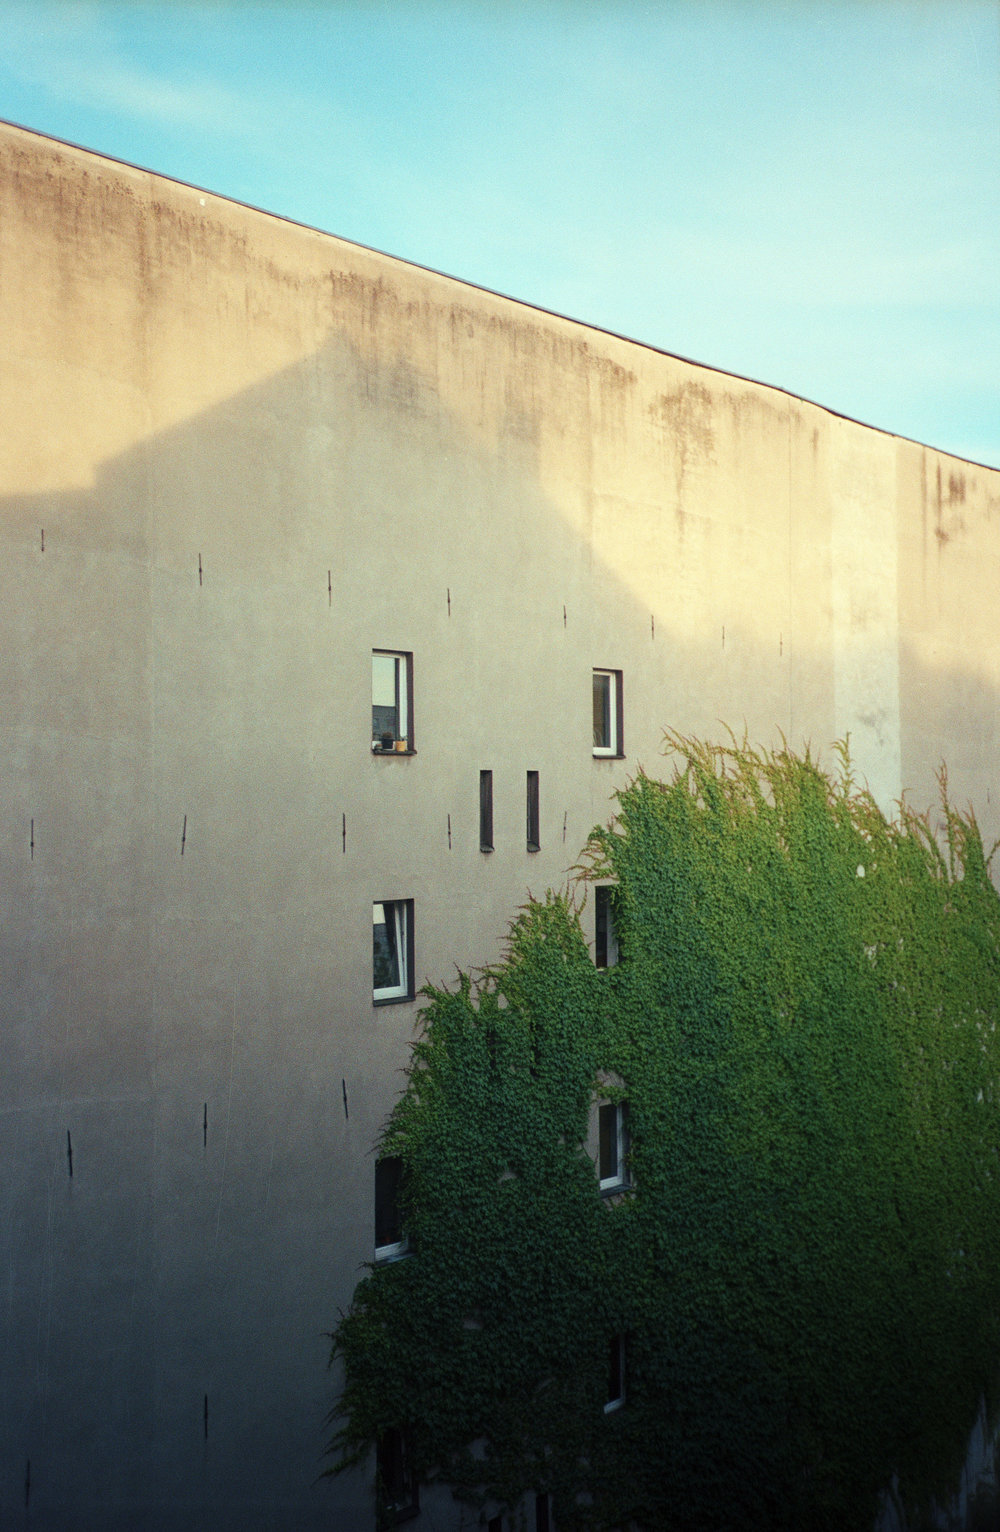 Berlin_72dpi-58.jpg